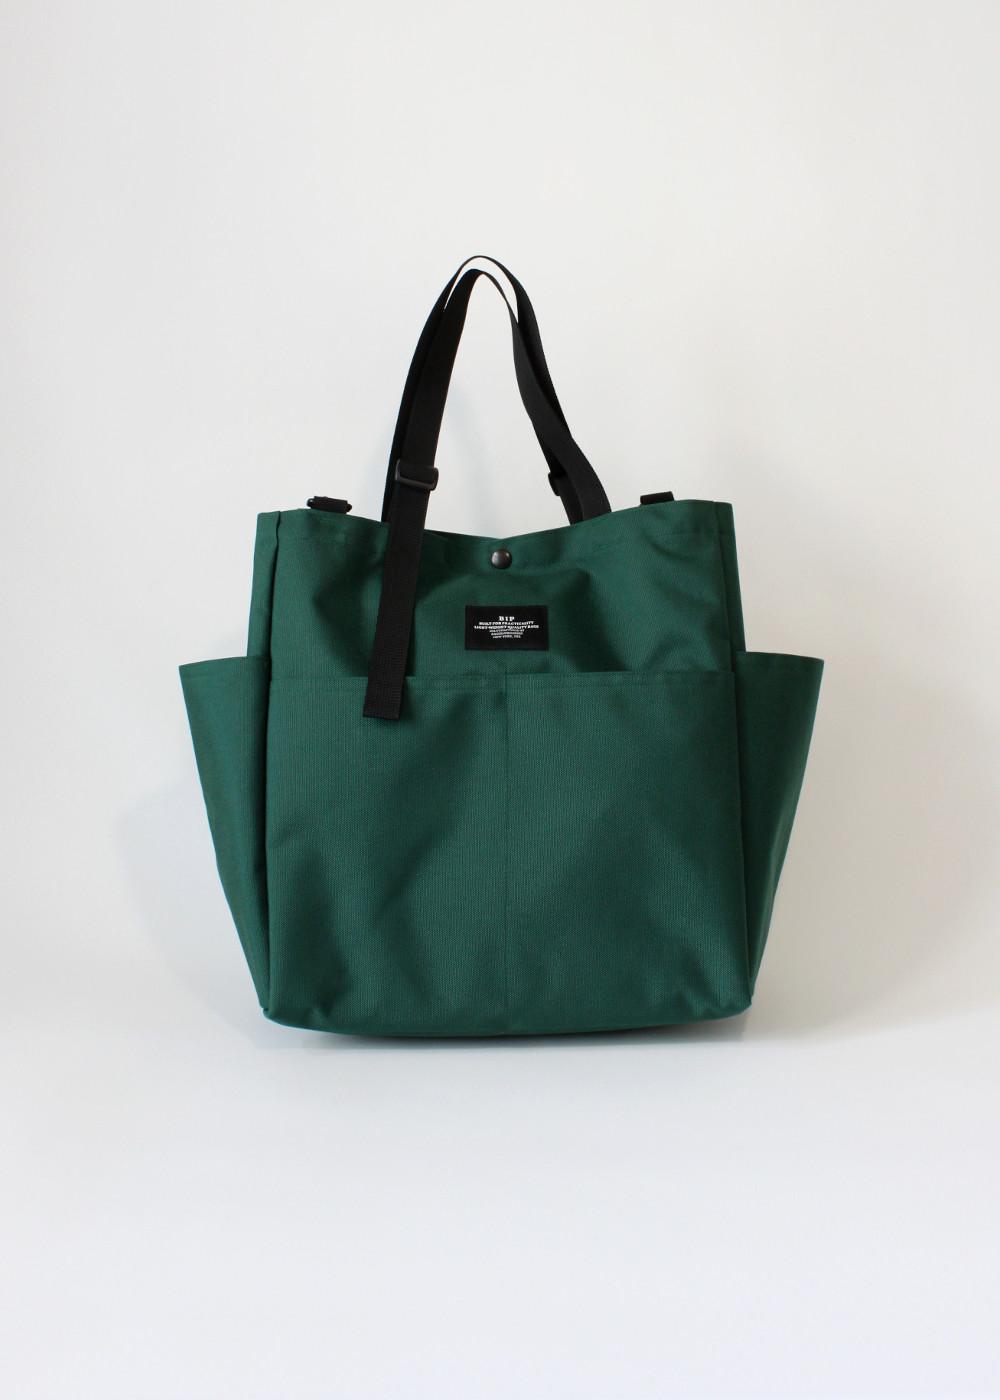 Bags-In-Progress-Carry-All-Beach-Bag-Darkgreen-Front